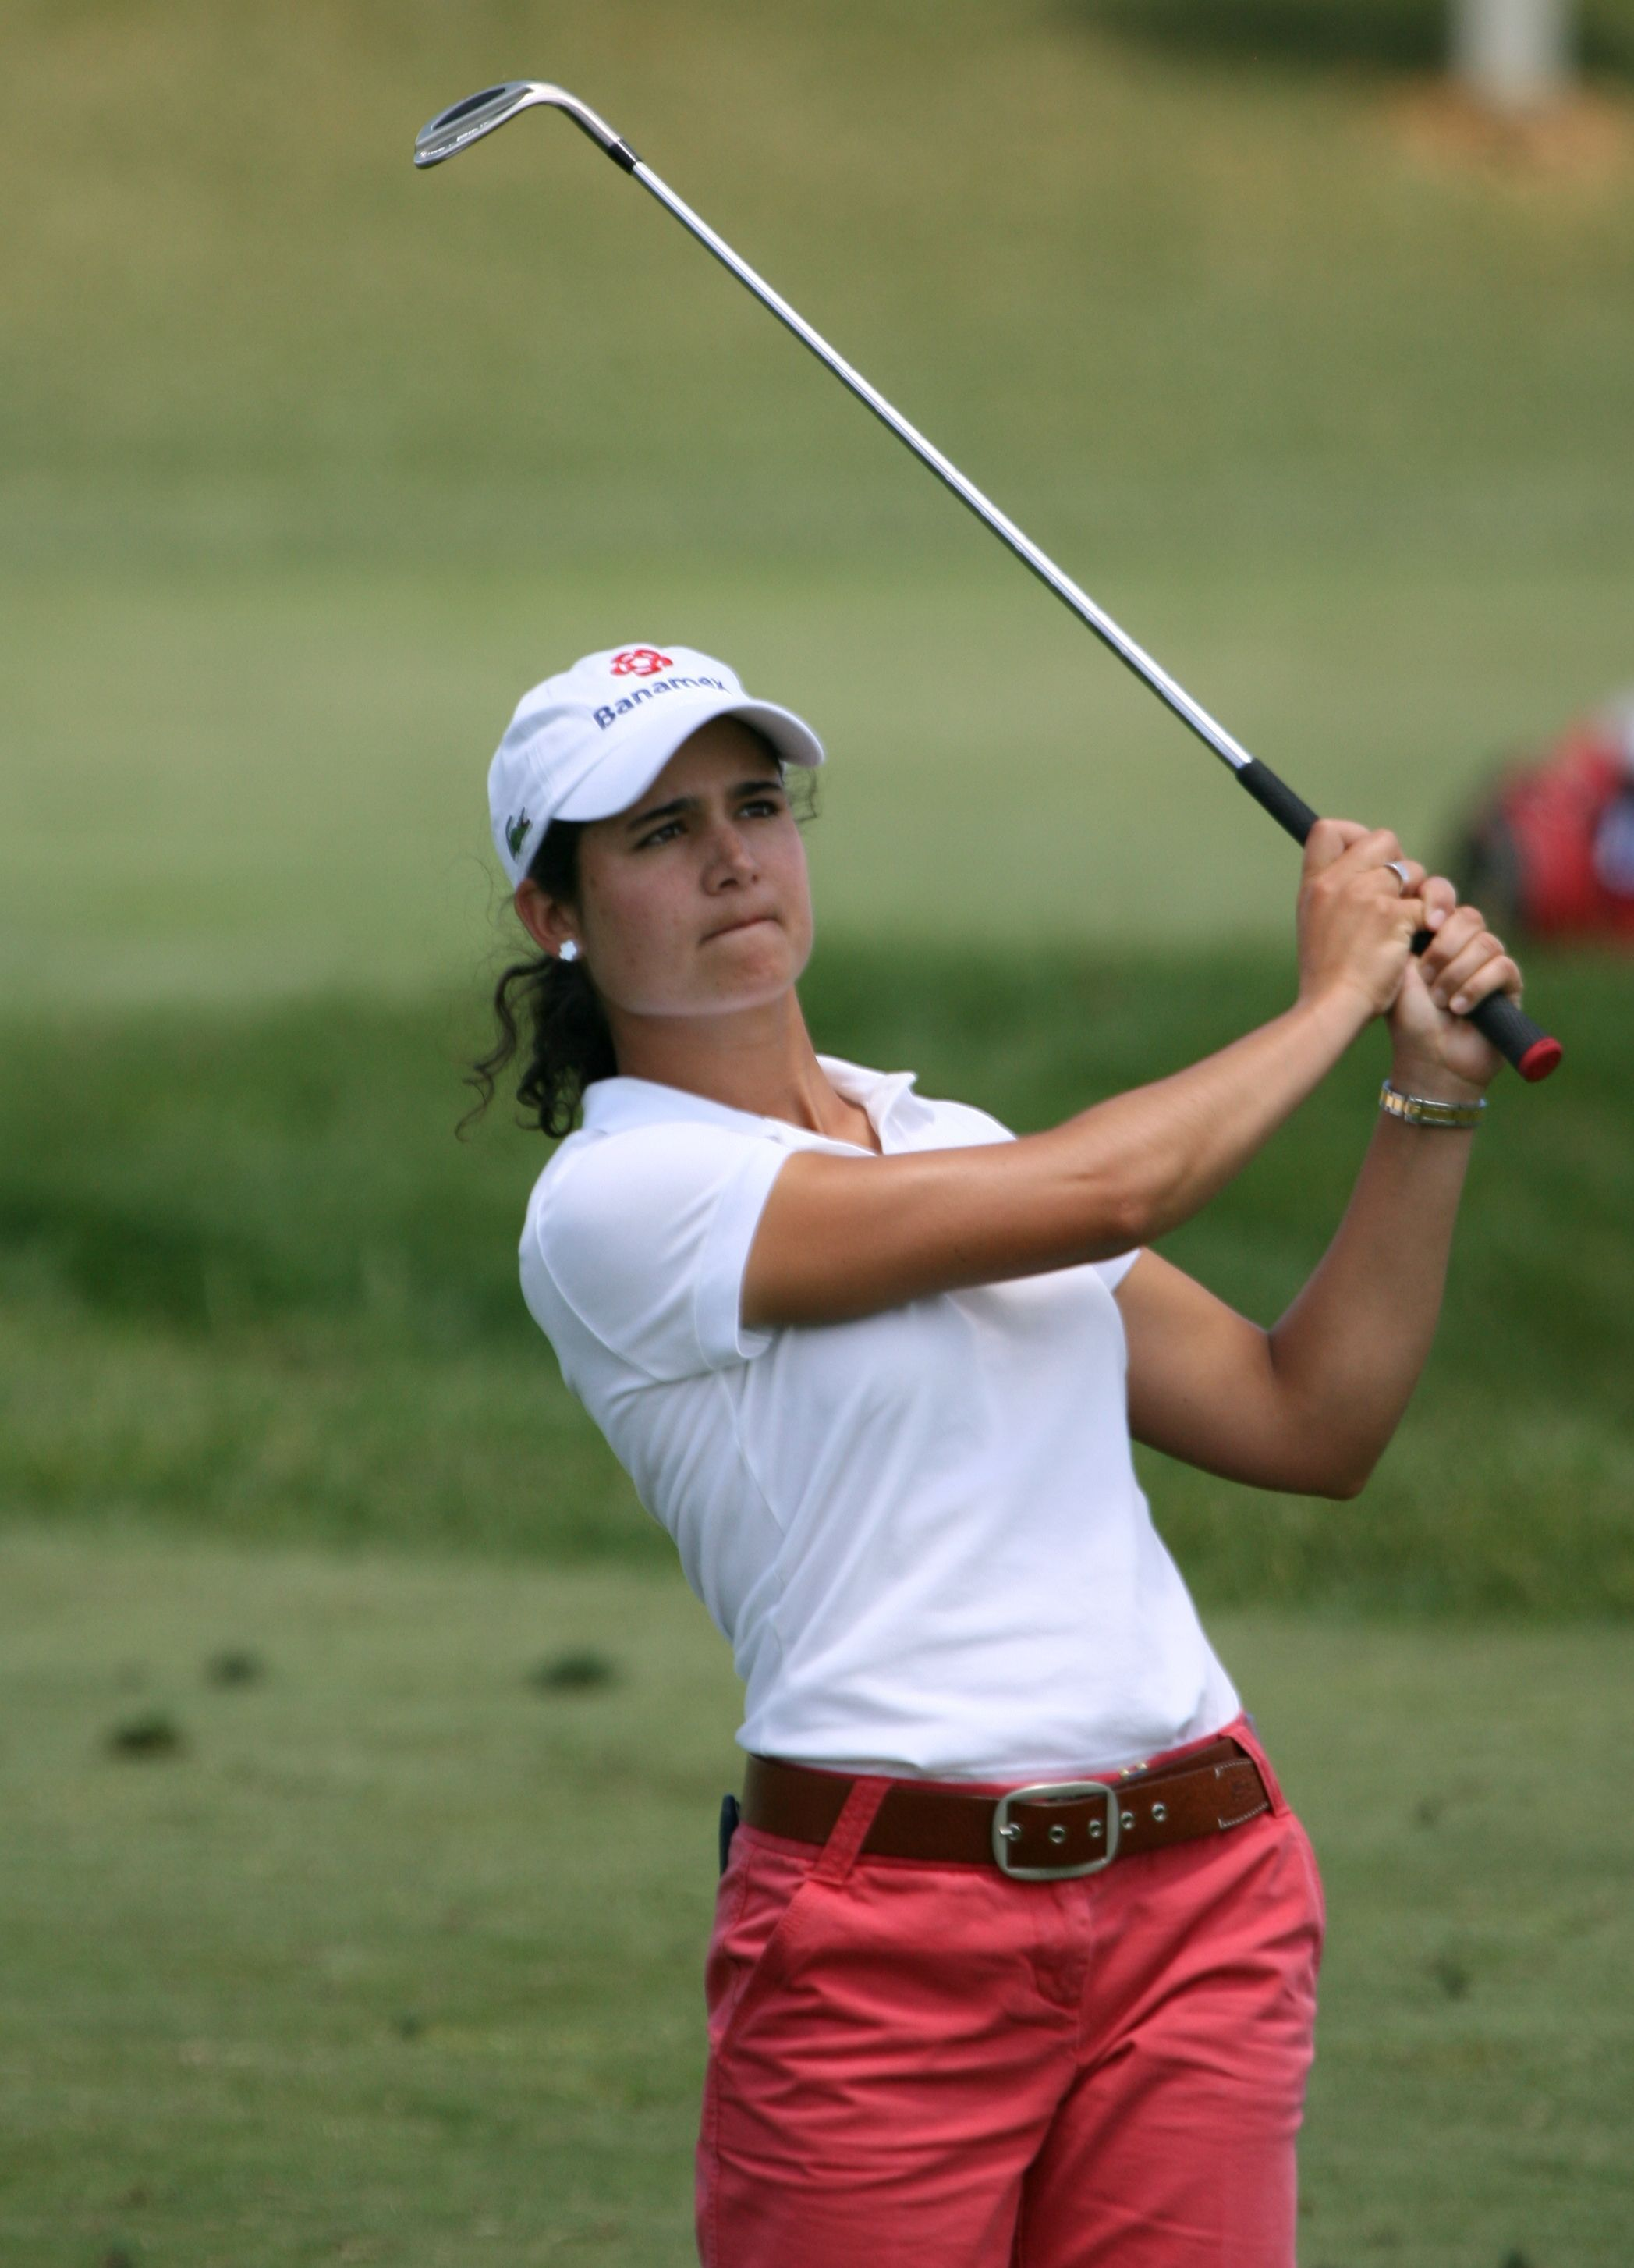 Lorena Ochoa clarifies: Only playing exhibition at LPGA